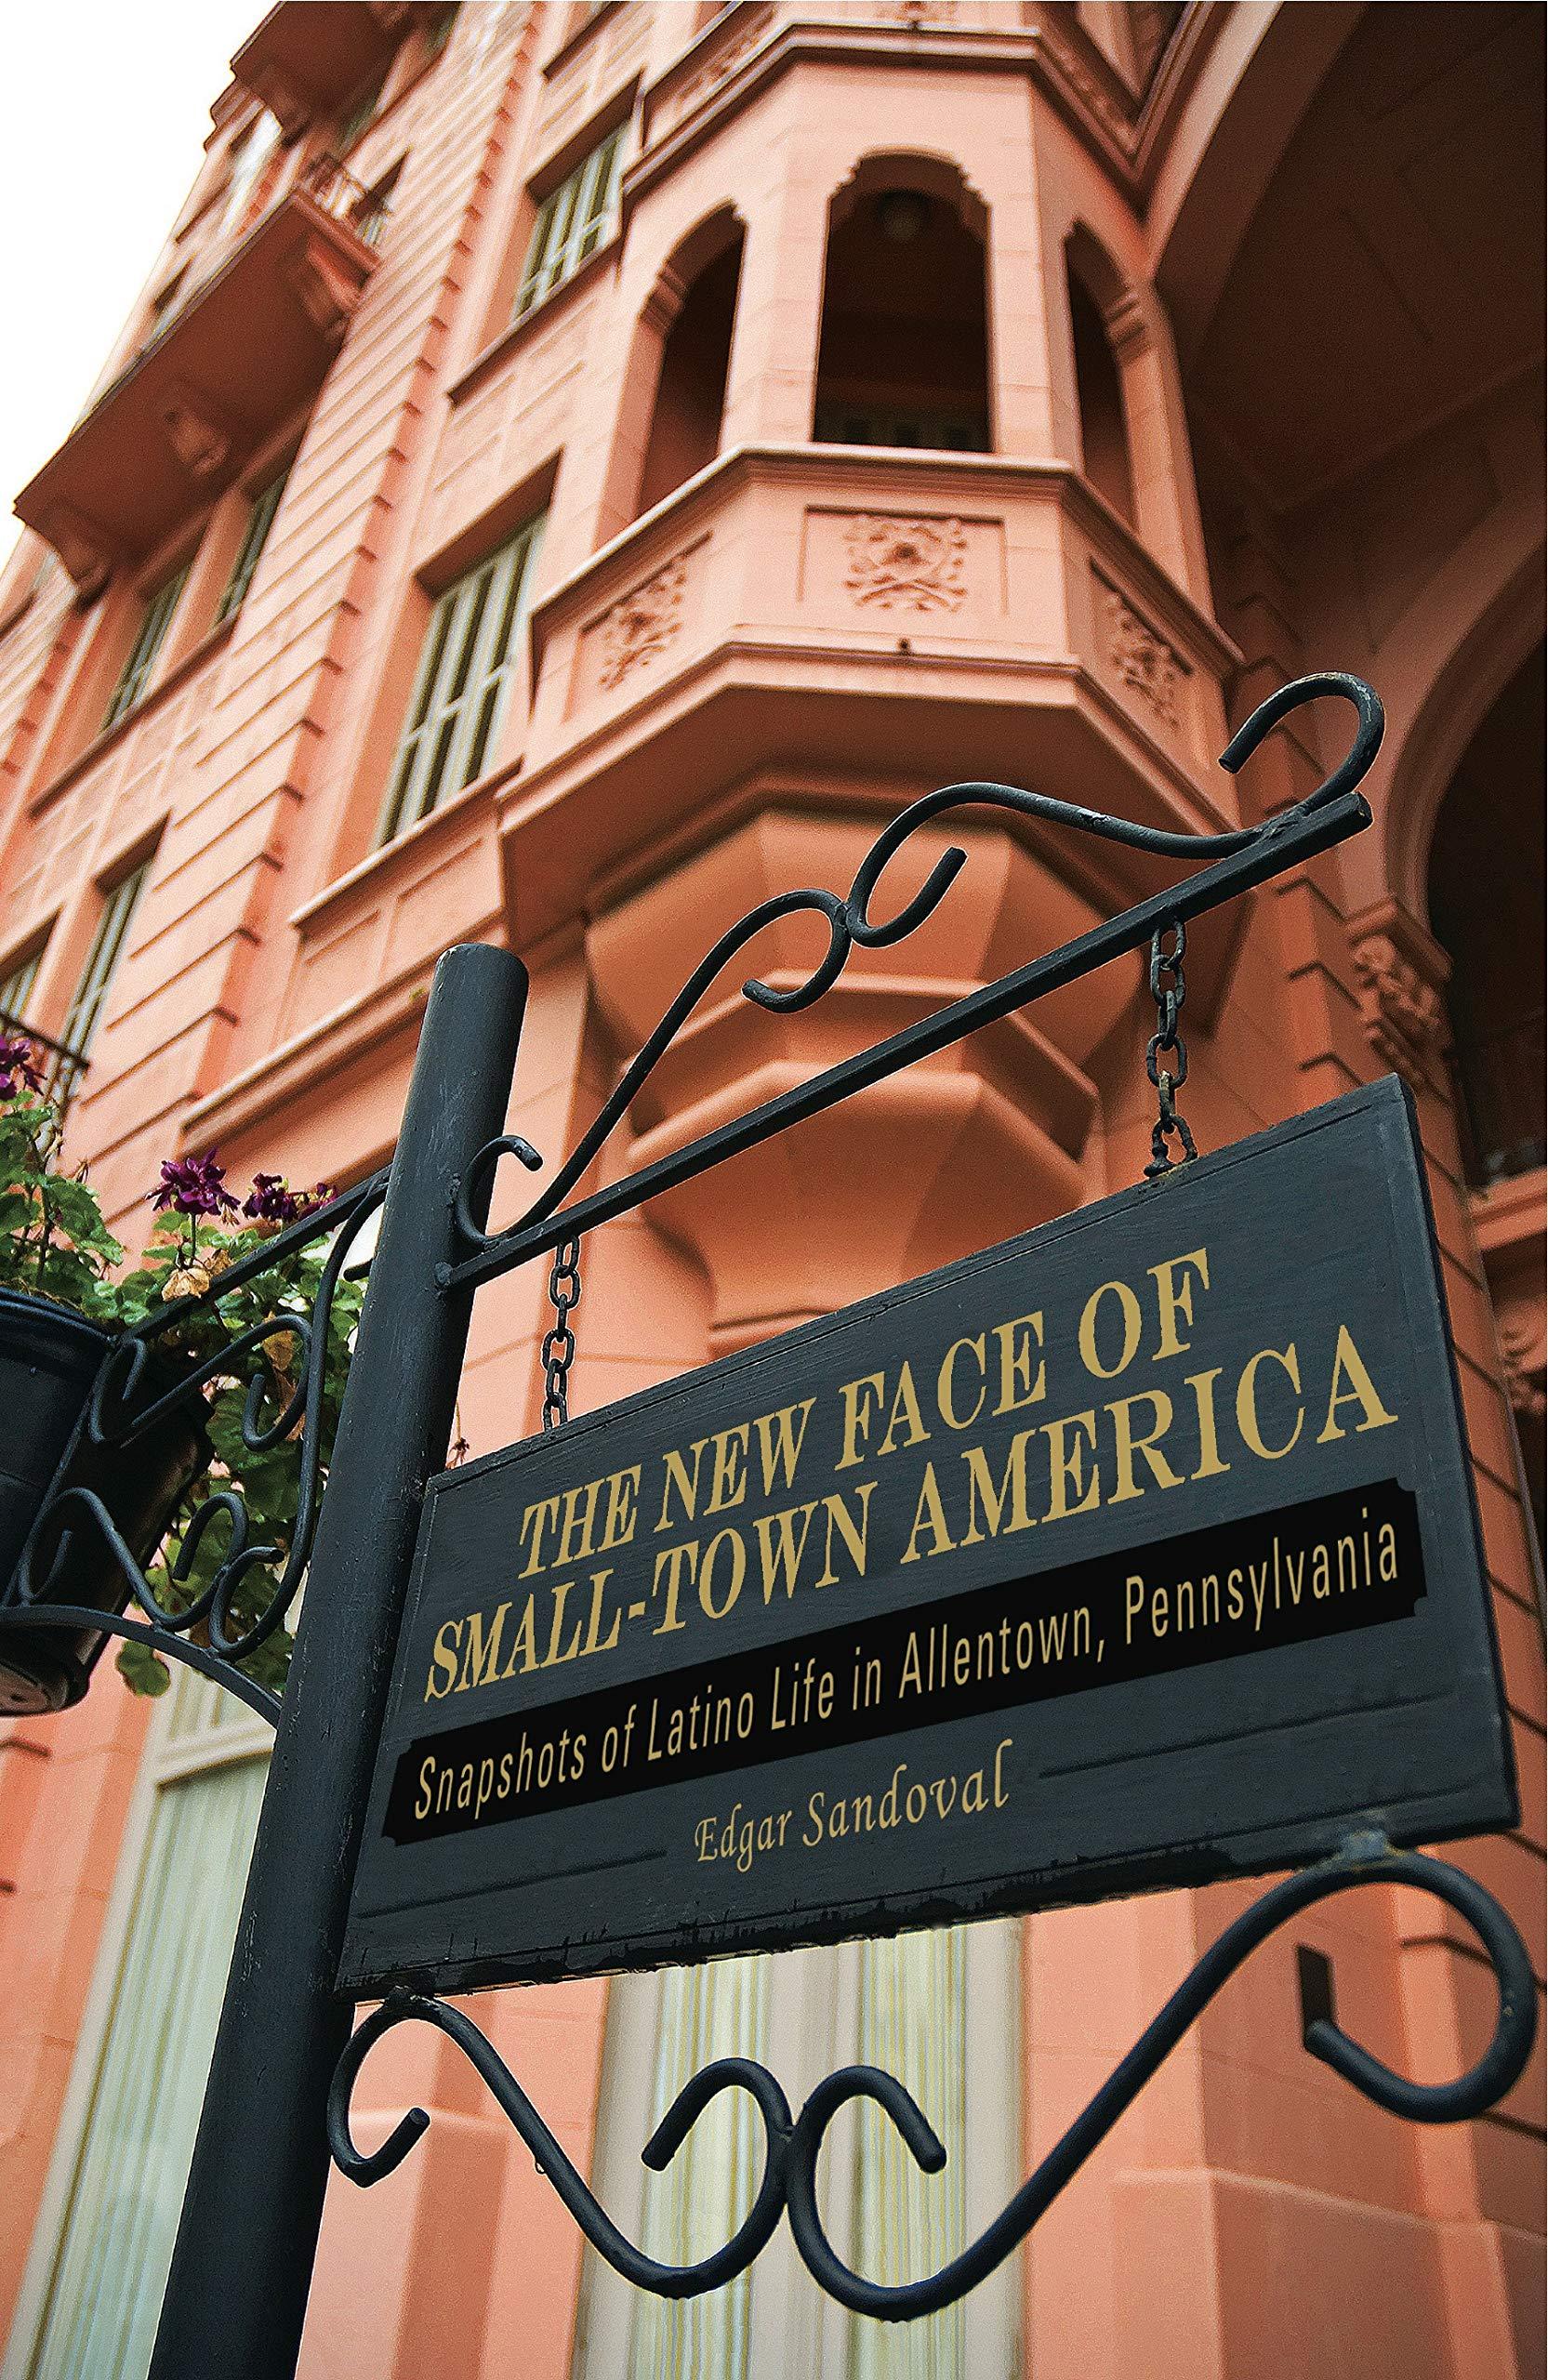 The New Face of Small-Town America: Snapshots of Latino Life in Allentown, Pennsylvania  Keystone Books: Amazon.es: Edgar Sandoval: Libros en idiomas ...